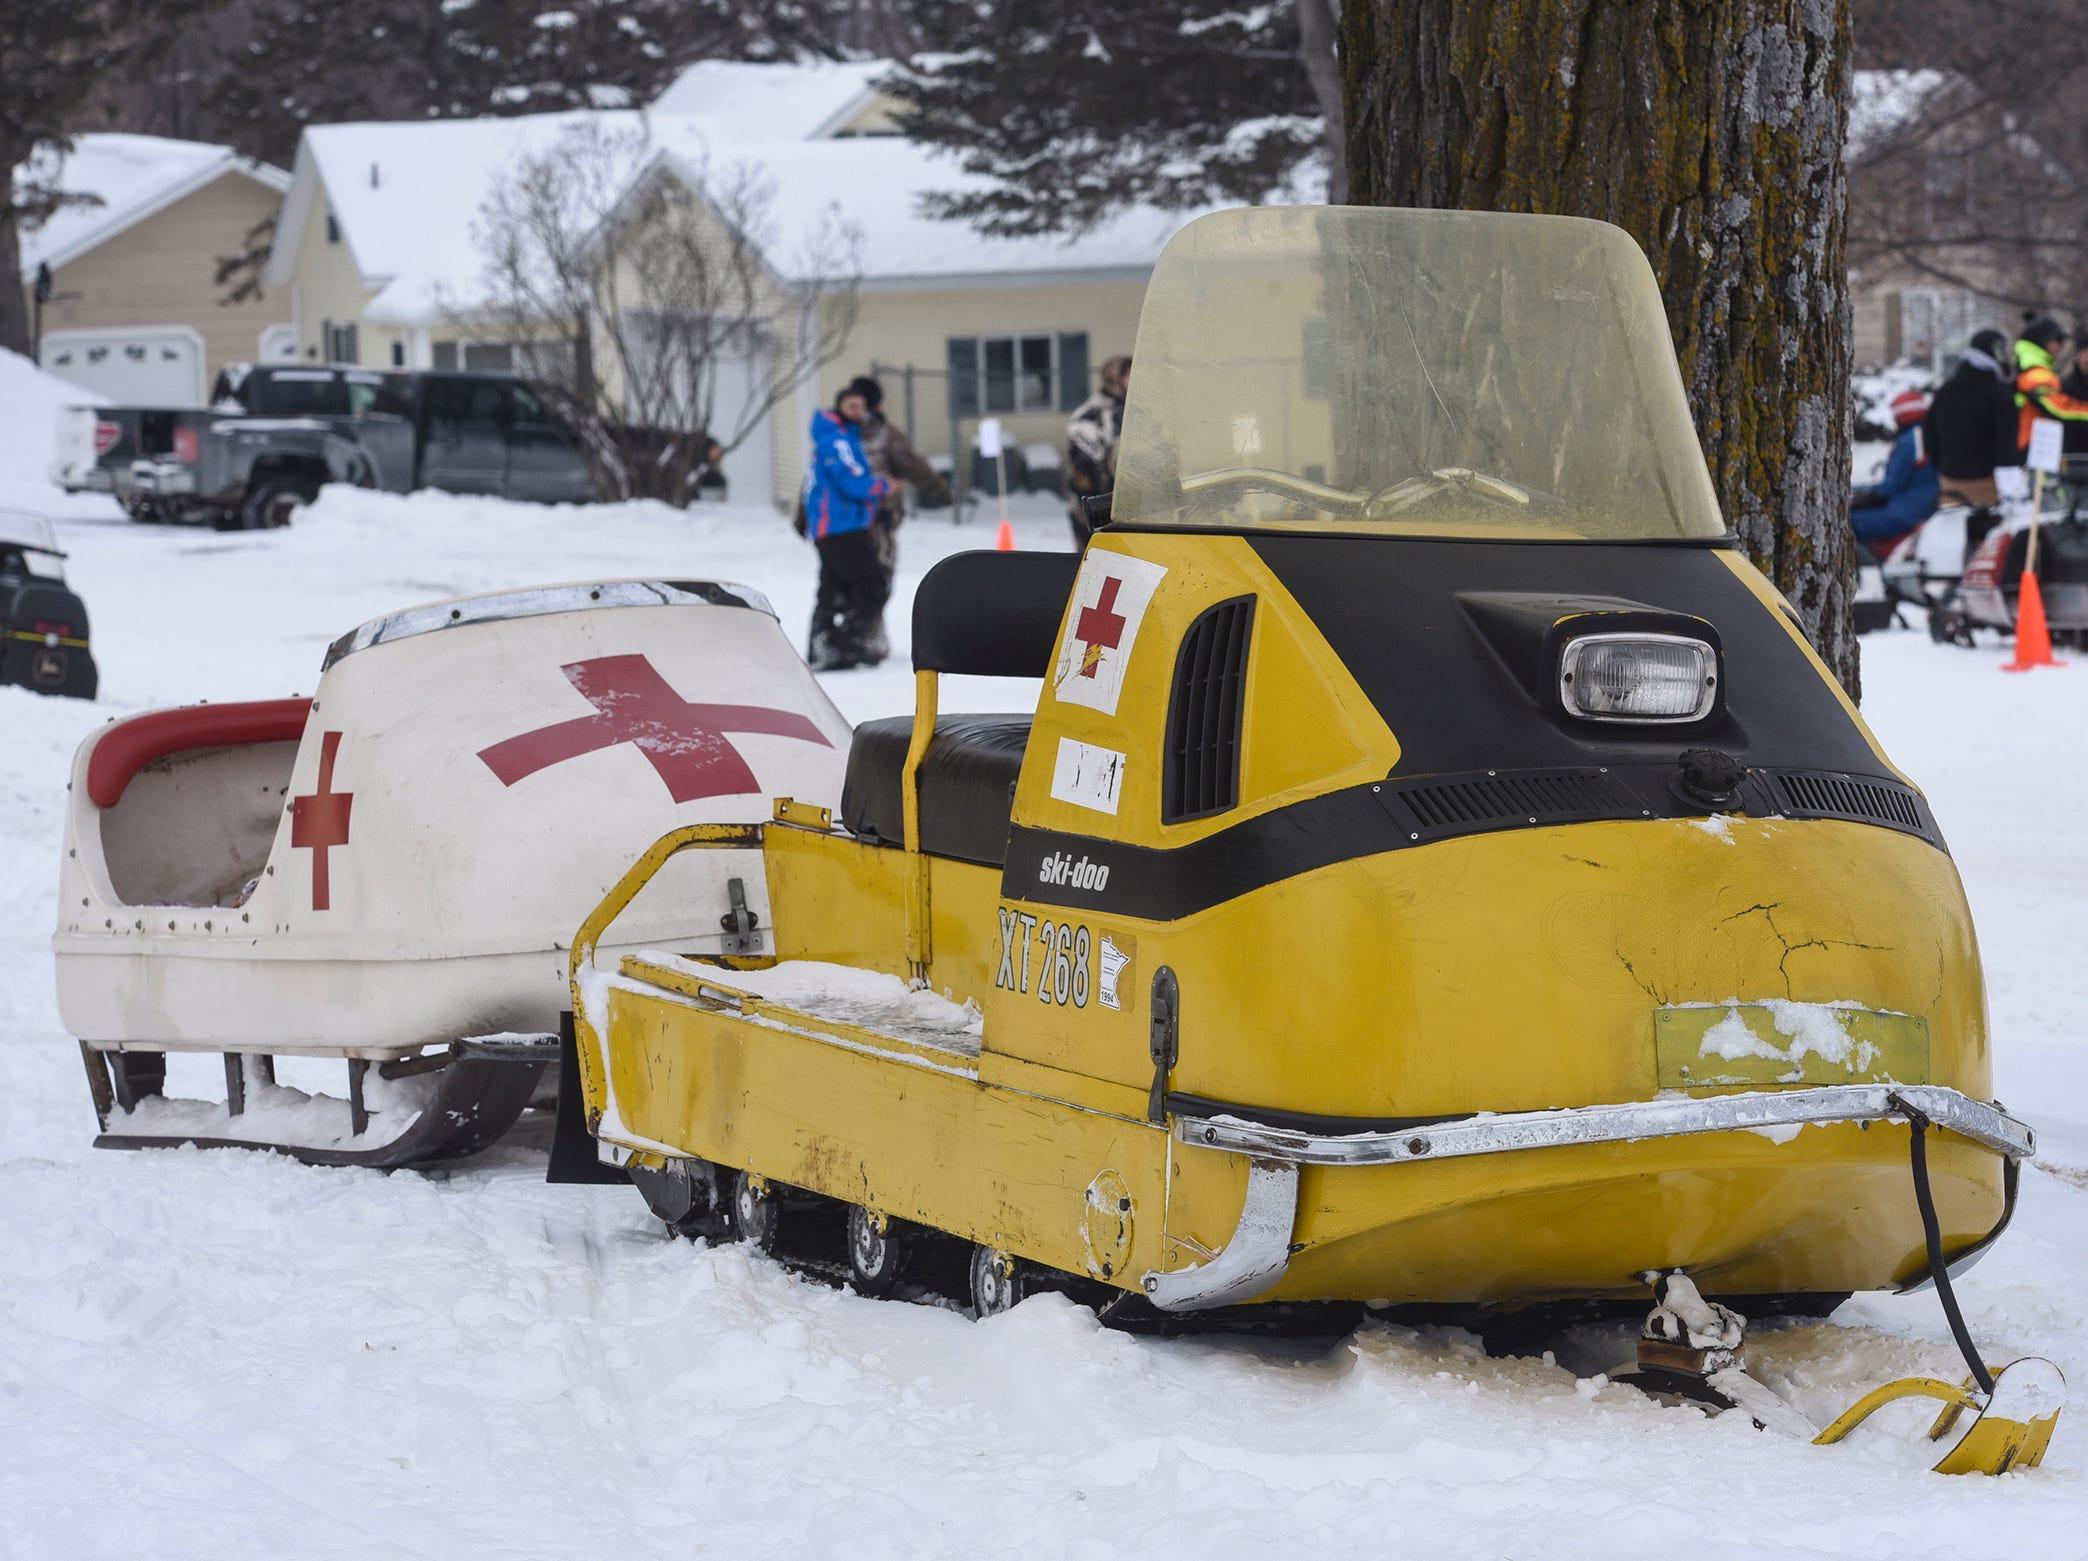 A vintage medical snowmobile is on display.